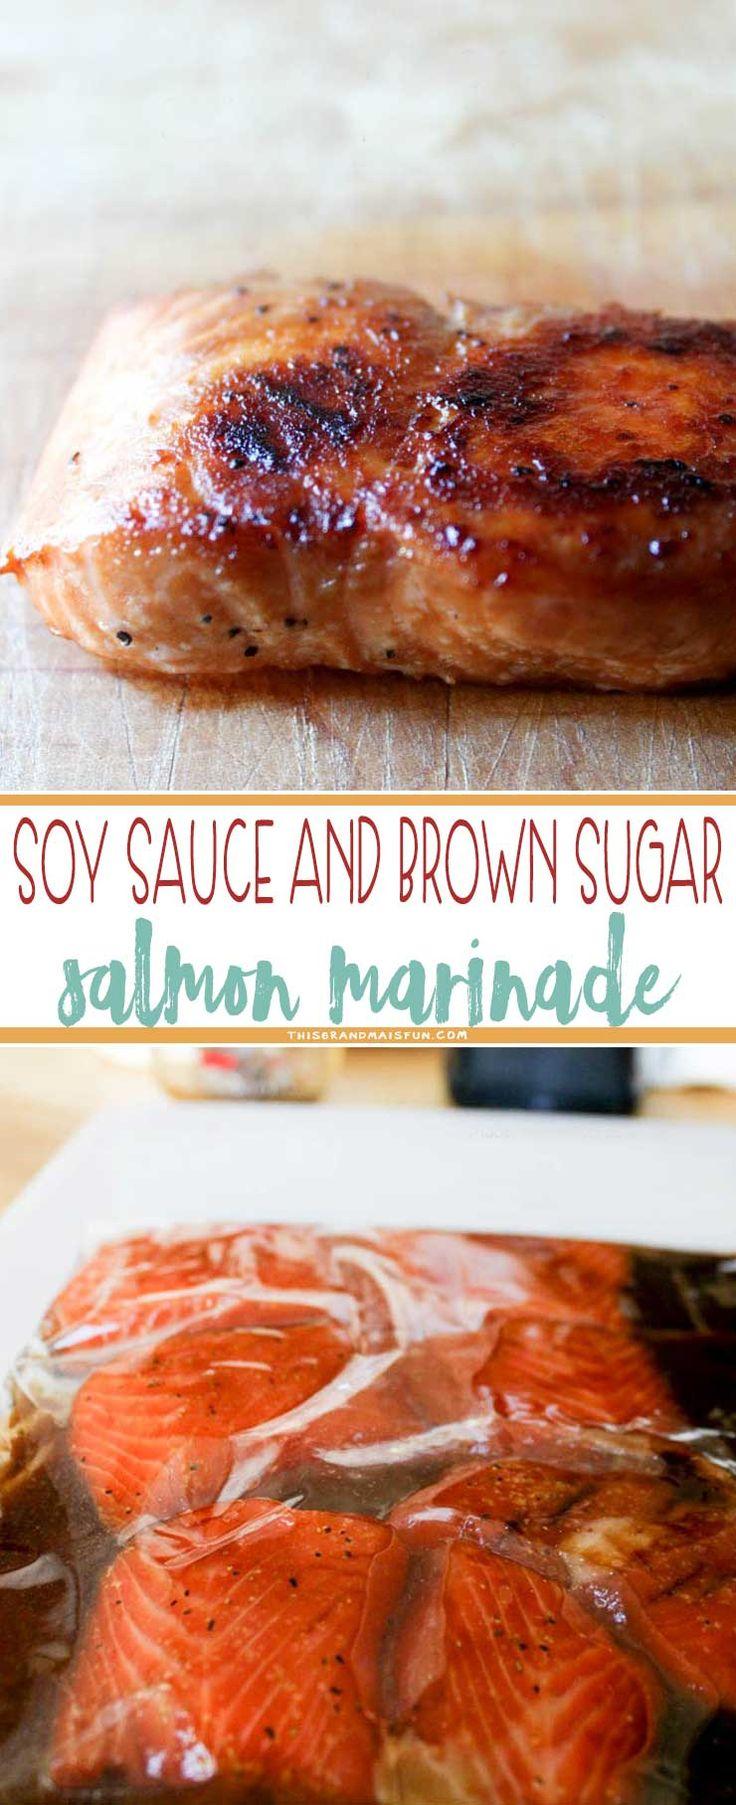 Best 25 Salmon recipes ideas on Pinterest  Cooking